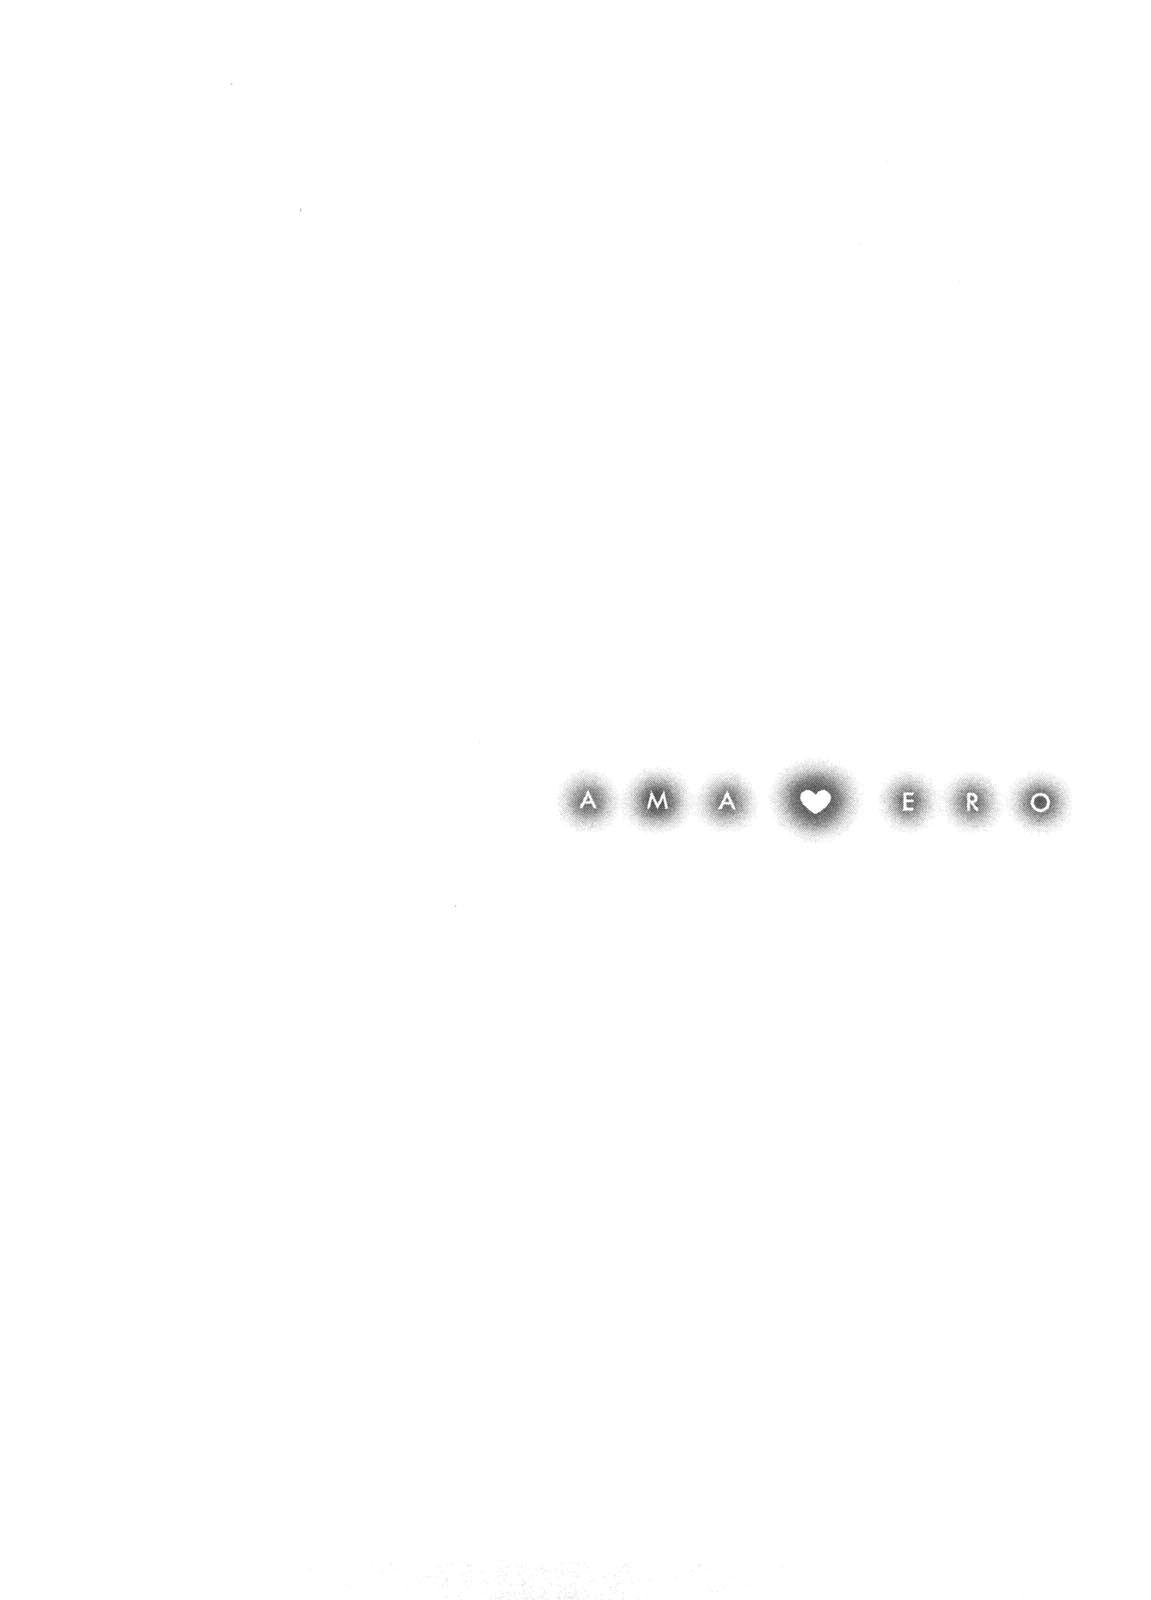 [Hanzaki Jirou] Ama Ero - Sweet Sugar Baby Ch. 1-7 [English] [Tadanohito] [Decensored] 50